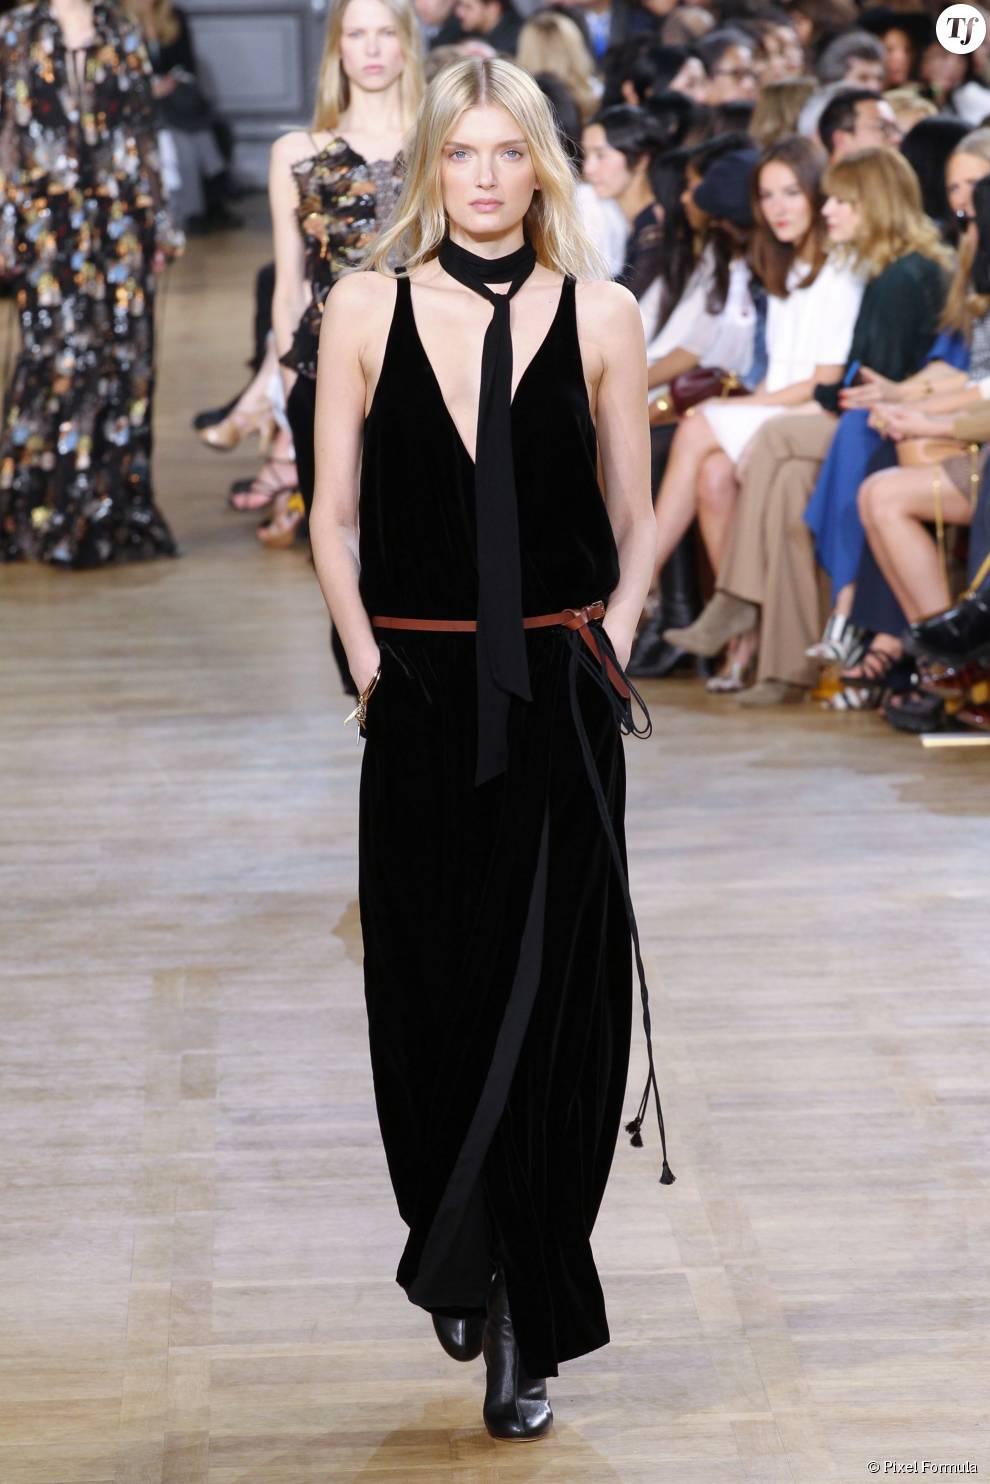 robe en velours noir au d fil pr t porter automne hiver 2015 2016 chlo terrafemina. Black Bedroom Furniture Sets. Home Design Ideas